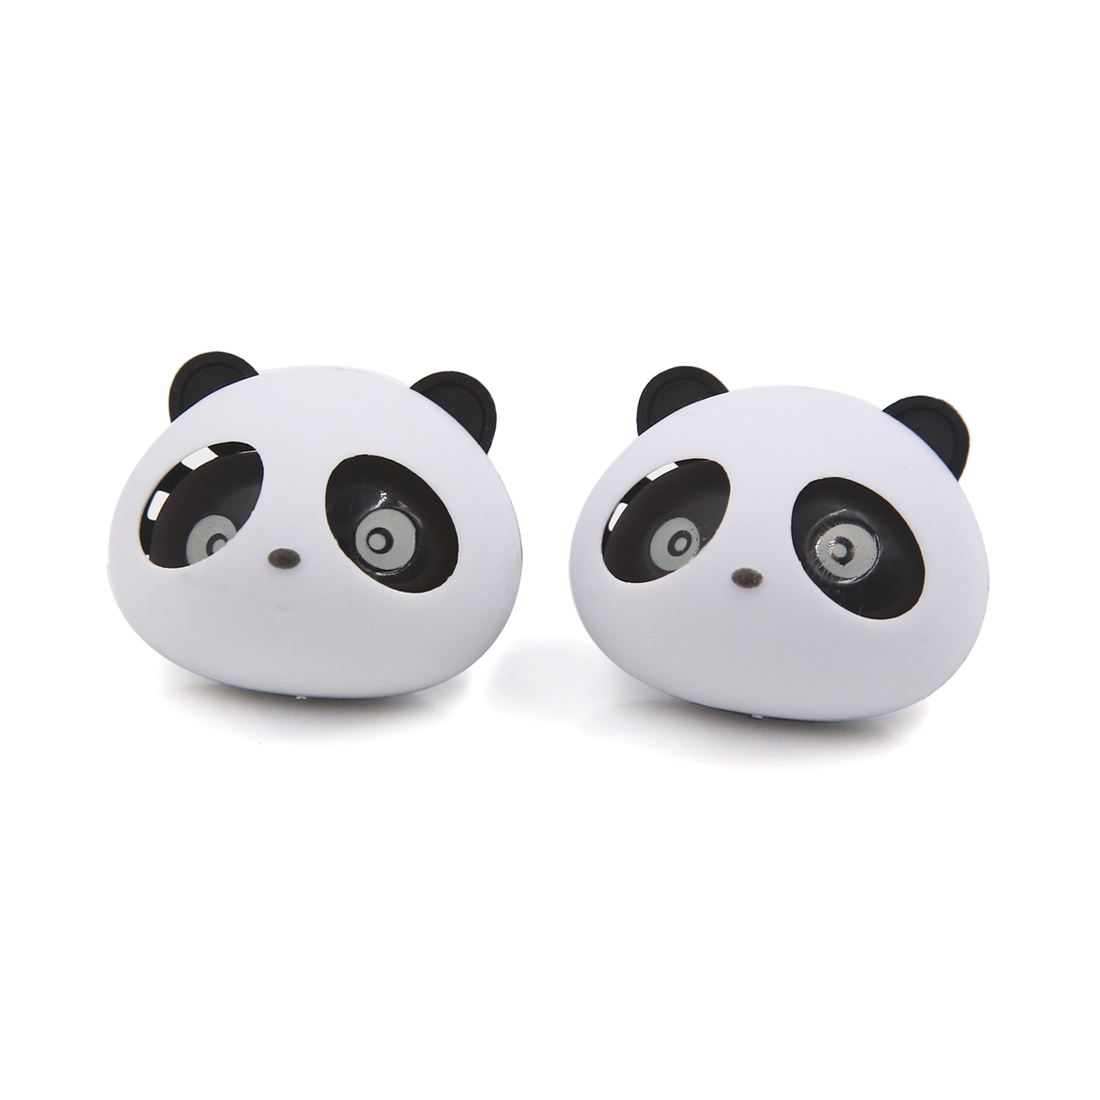 Panda Head Shaped Car Air Freshener Auto Perfume Diffuser Fragrance 2pcs